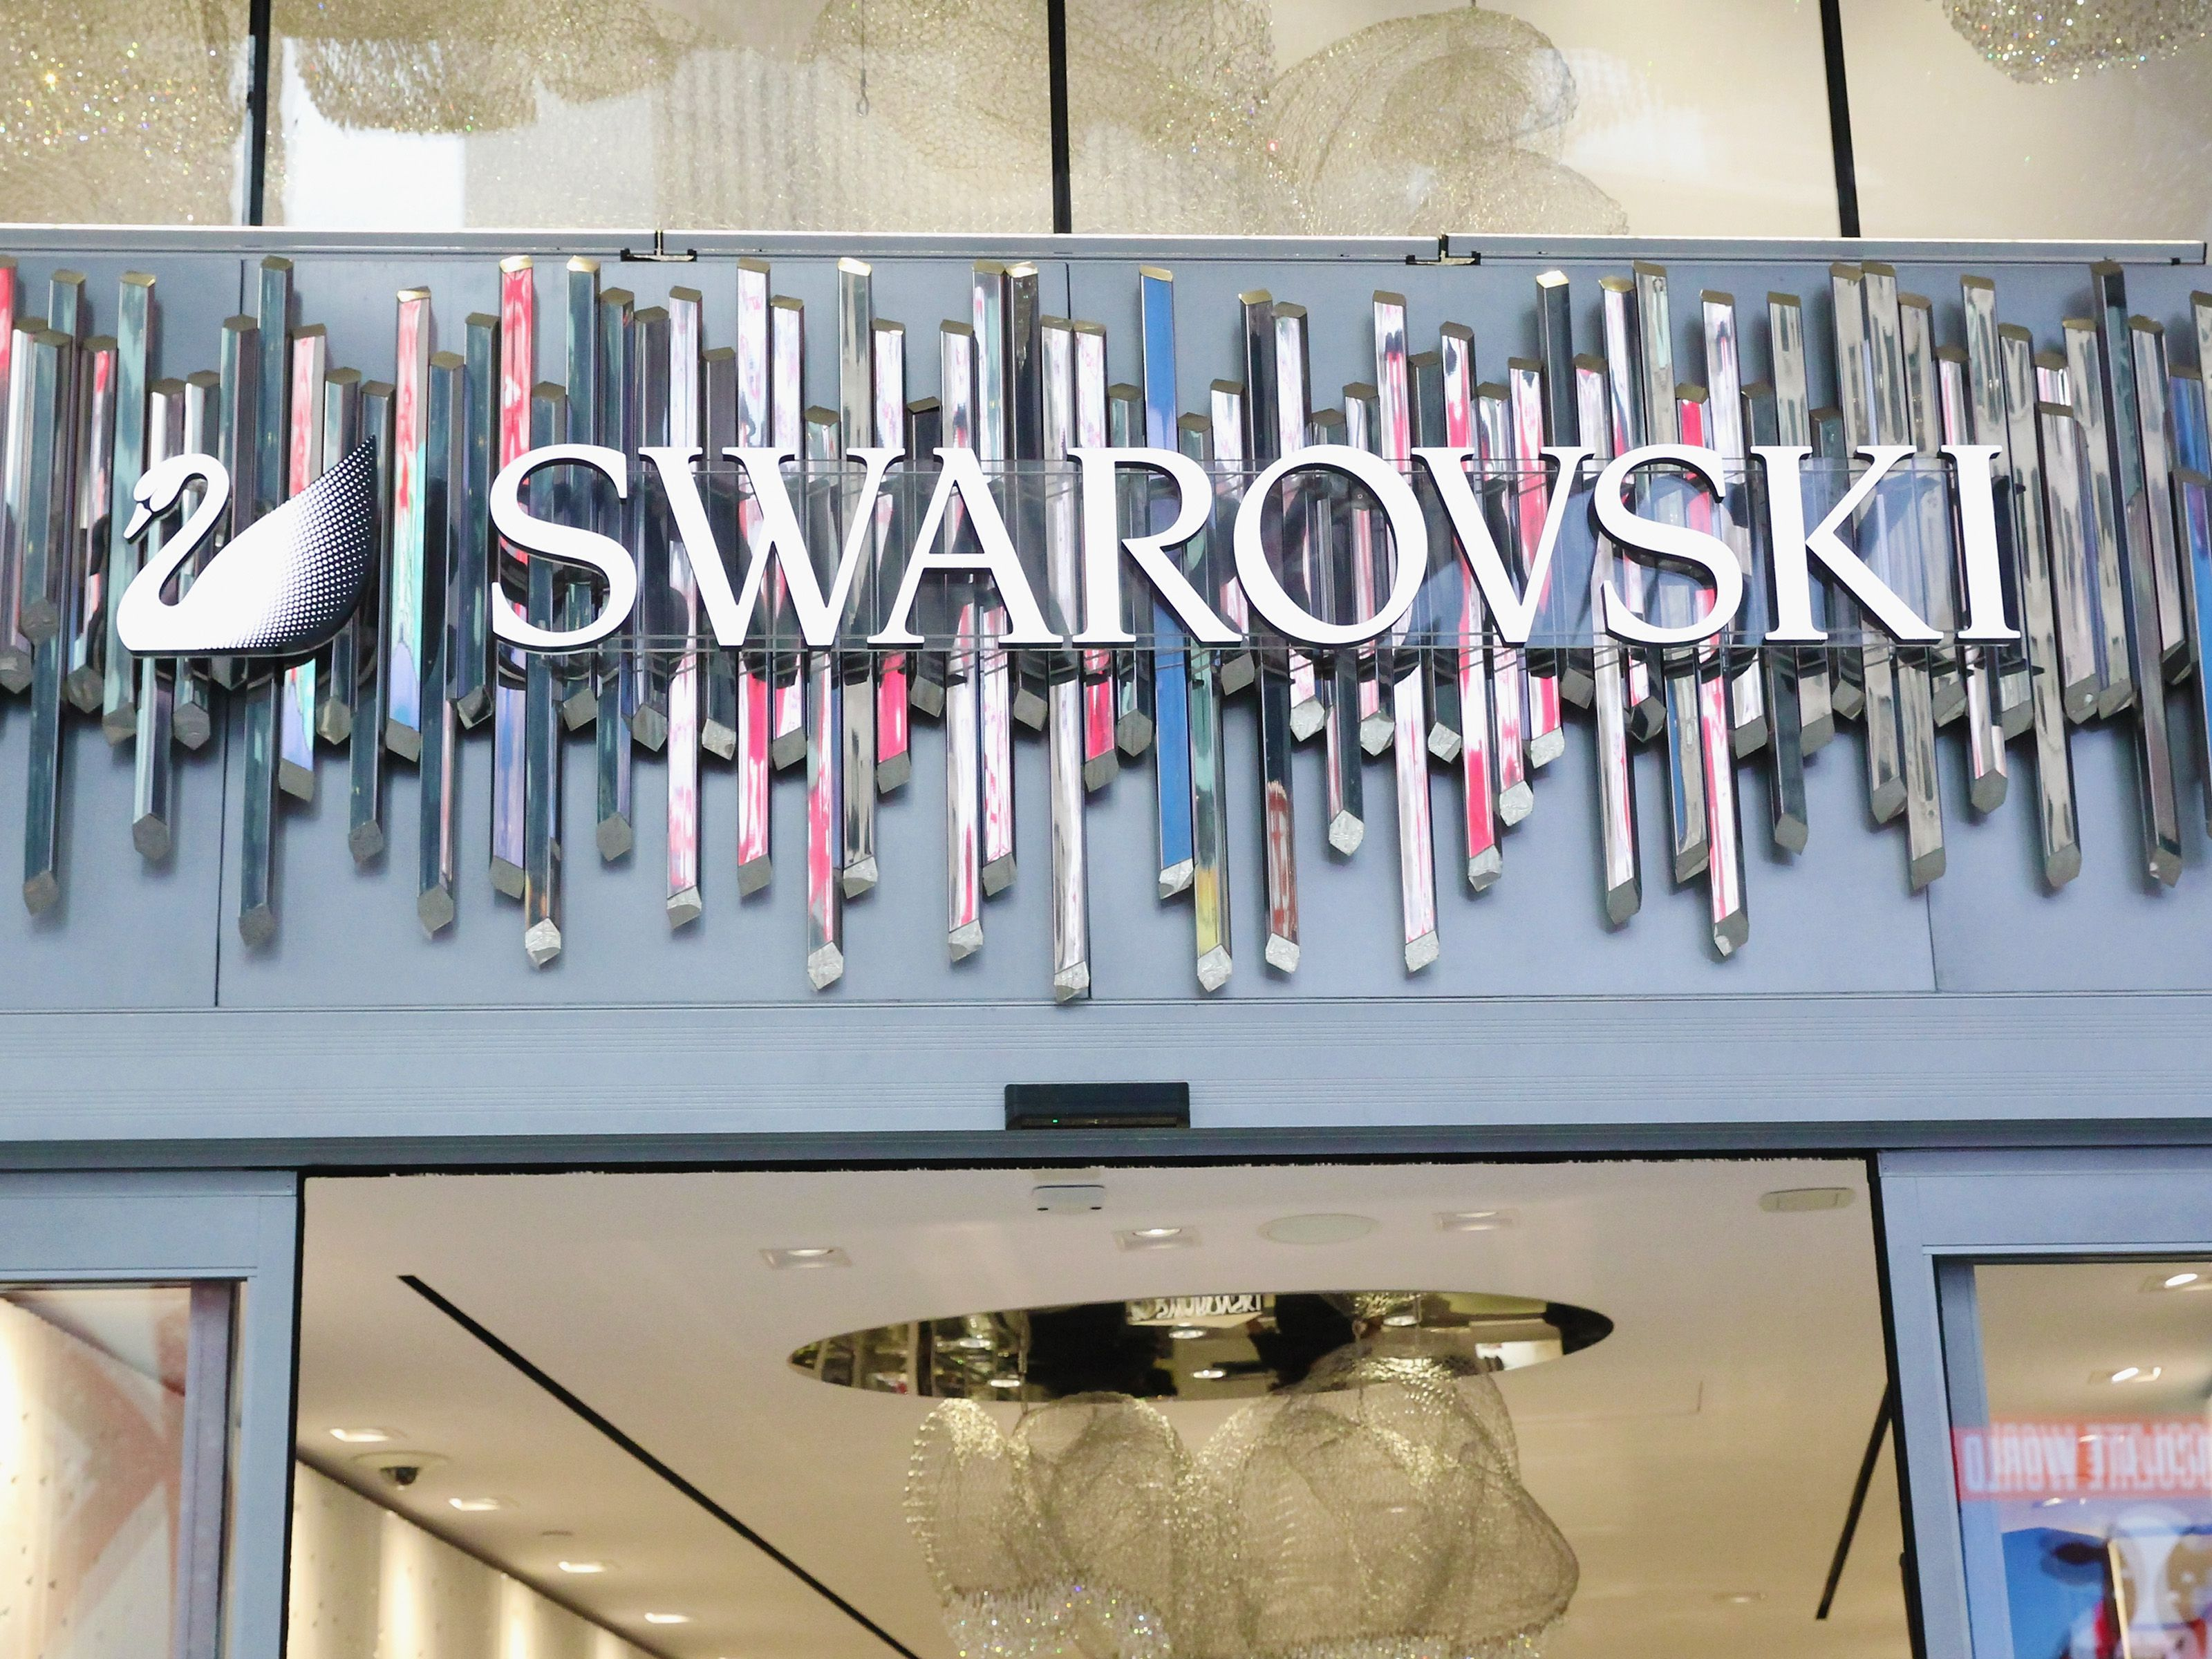 Swarovski Crystals and Swarovski Elements Guide